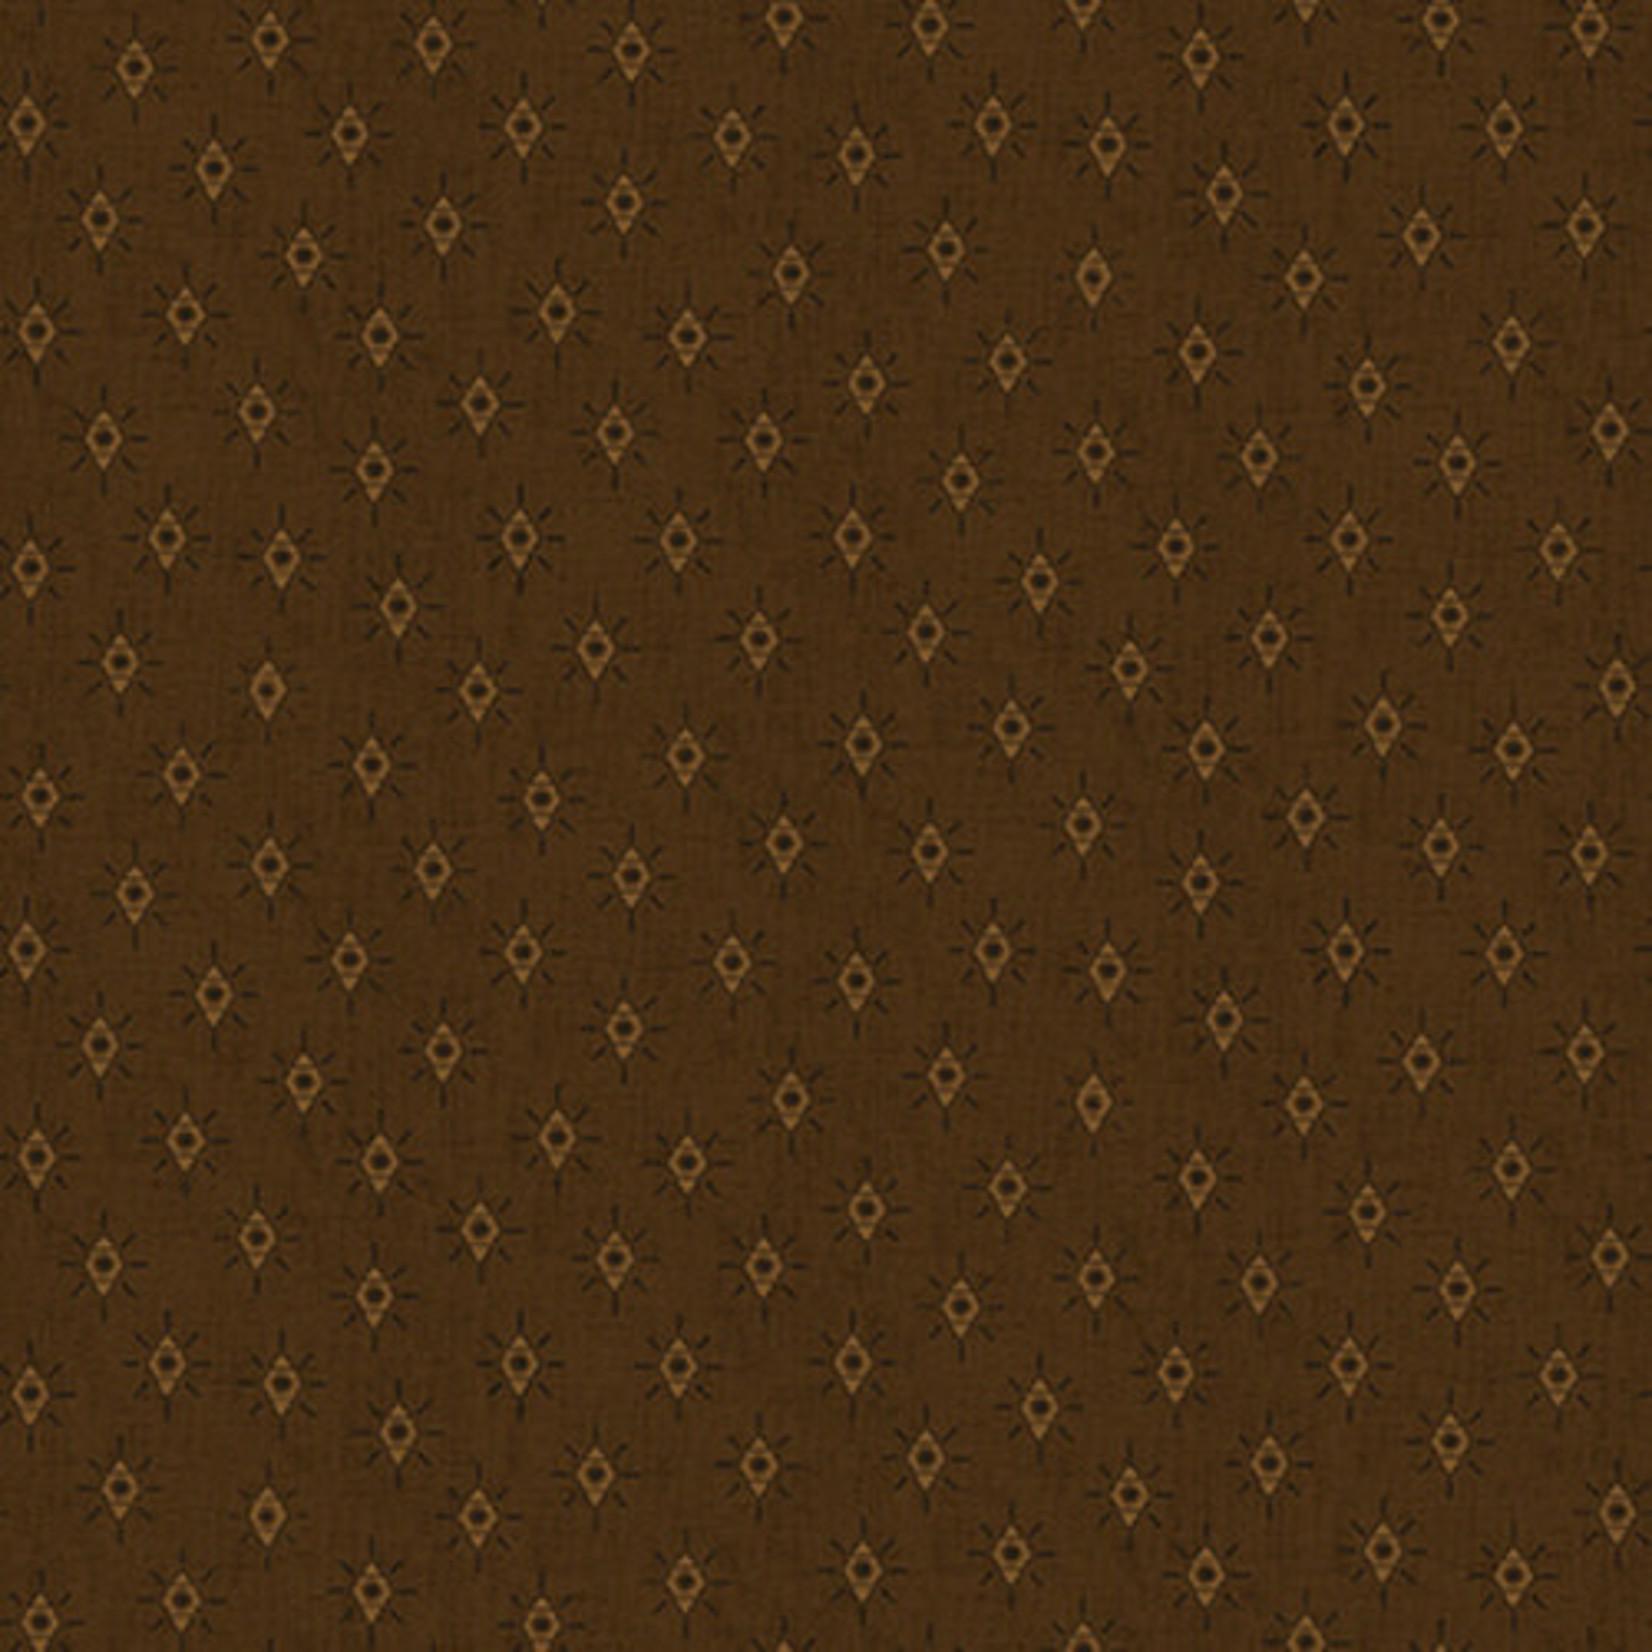 Blank Quilting Barn Dance - Diamonds - Brown